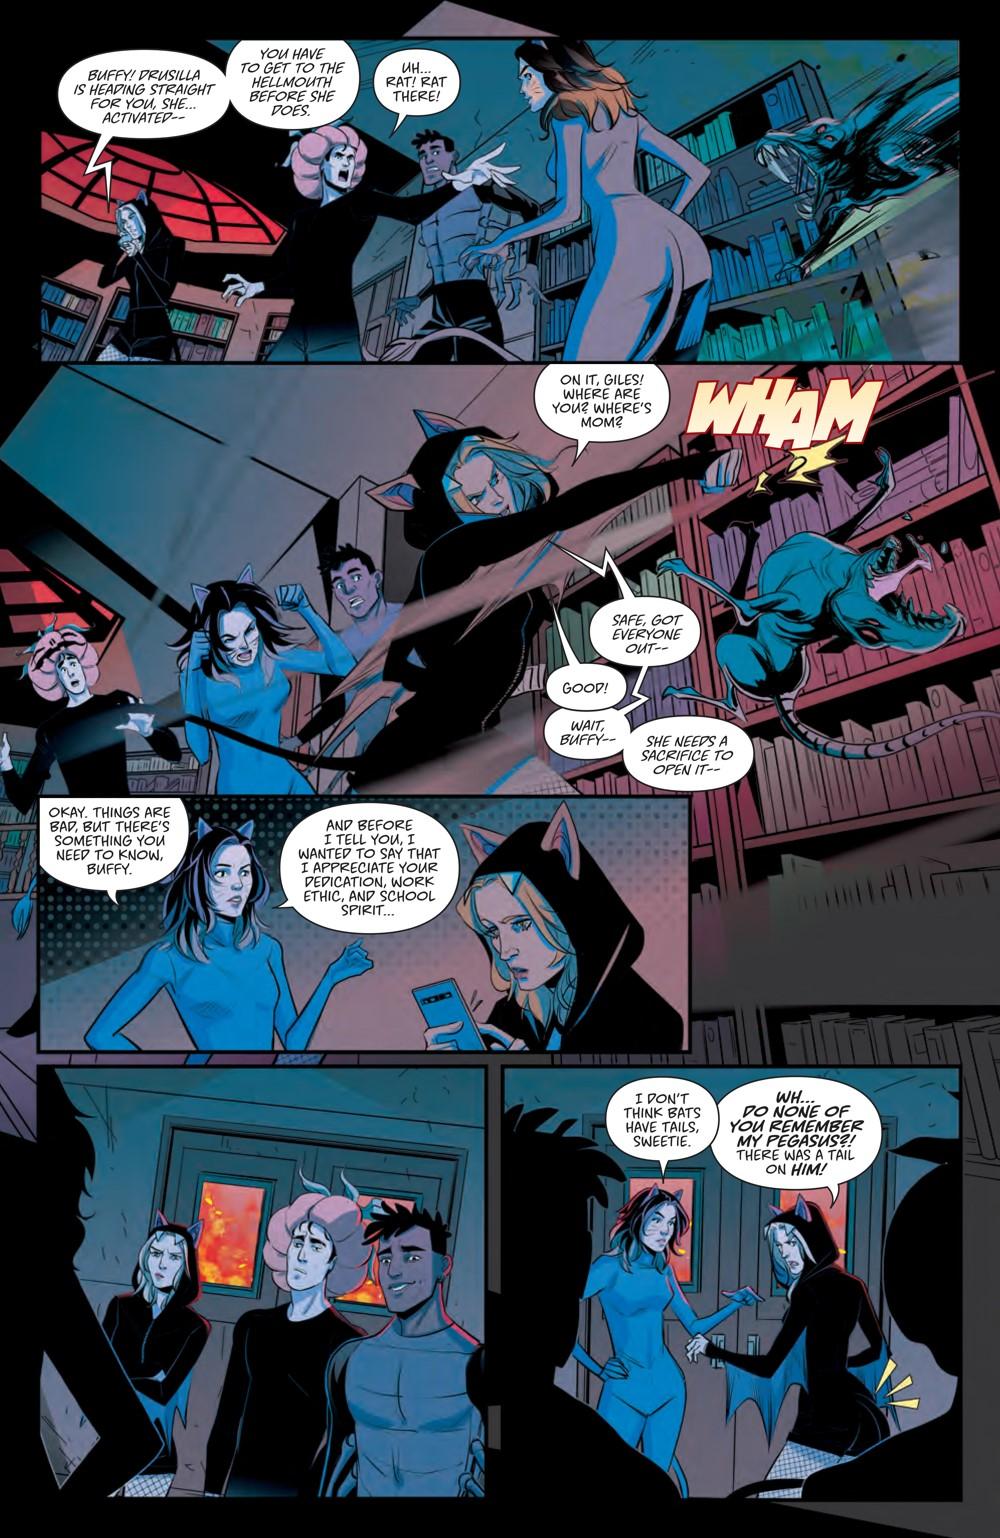 Hellmouth_SC_PRESS_15 ComicList Previews: BUFFY THE VAMPIRE SLAYER HELLMOUTH TP